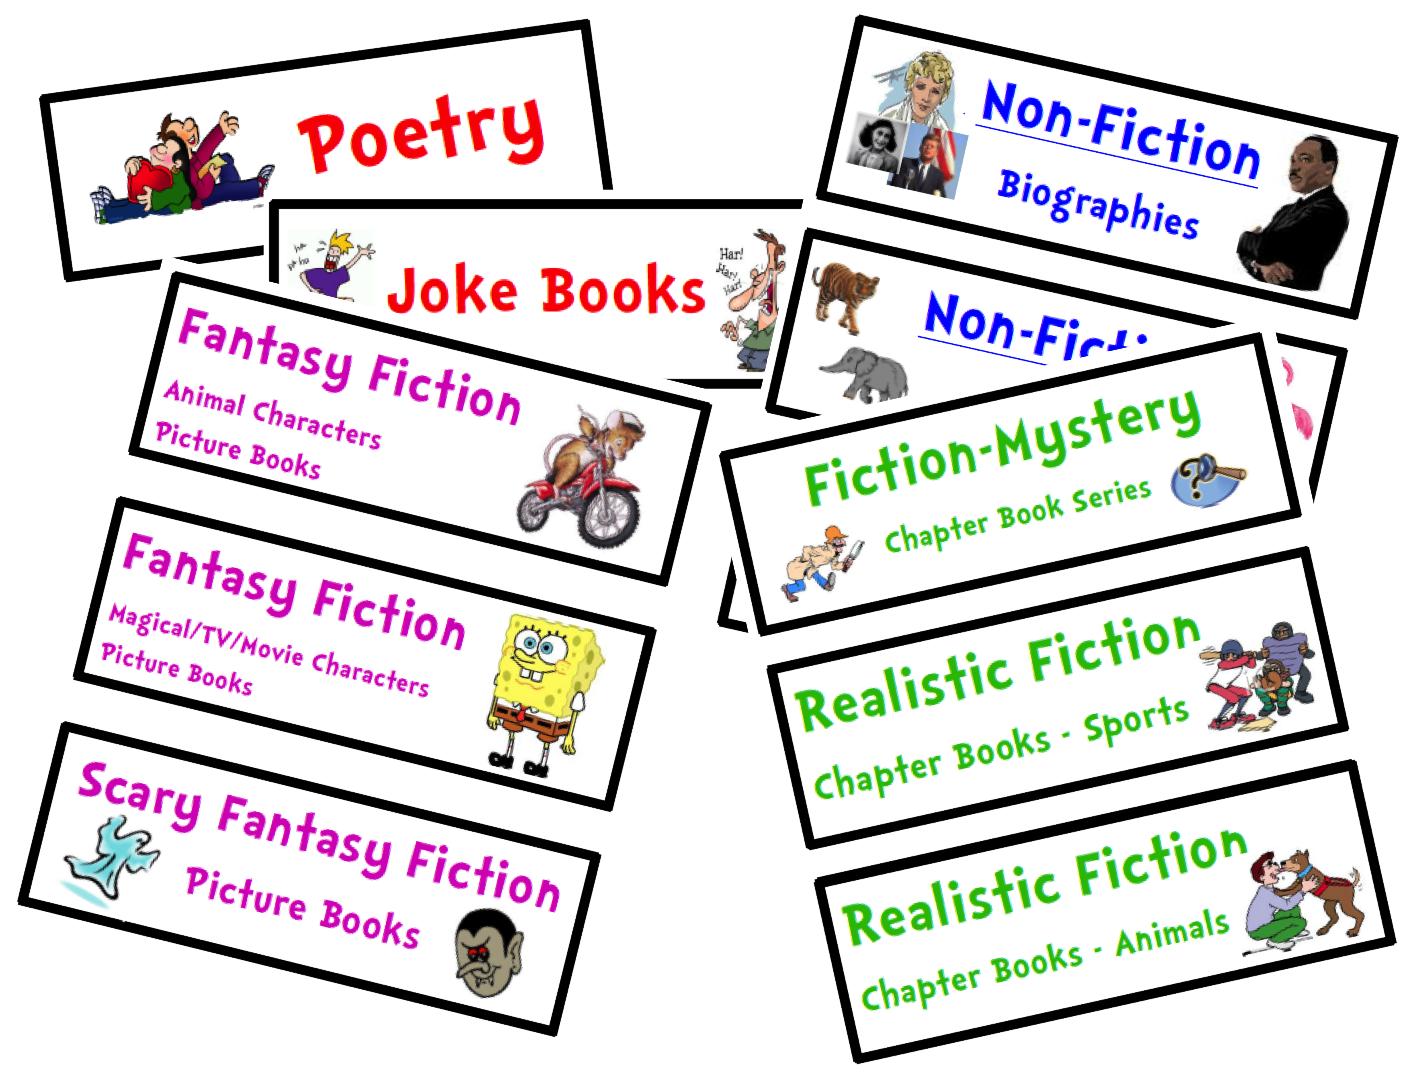 Organized clipart organized book. Organize your classroom library